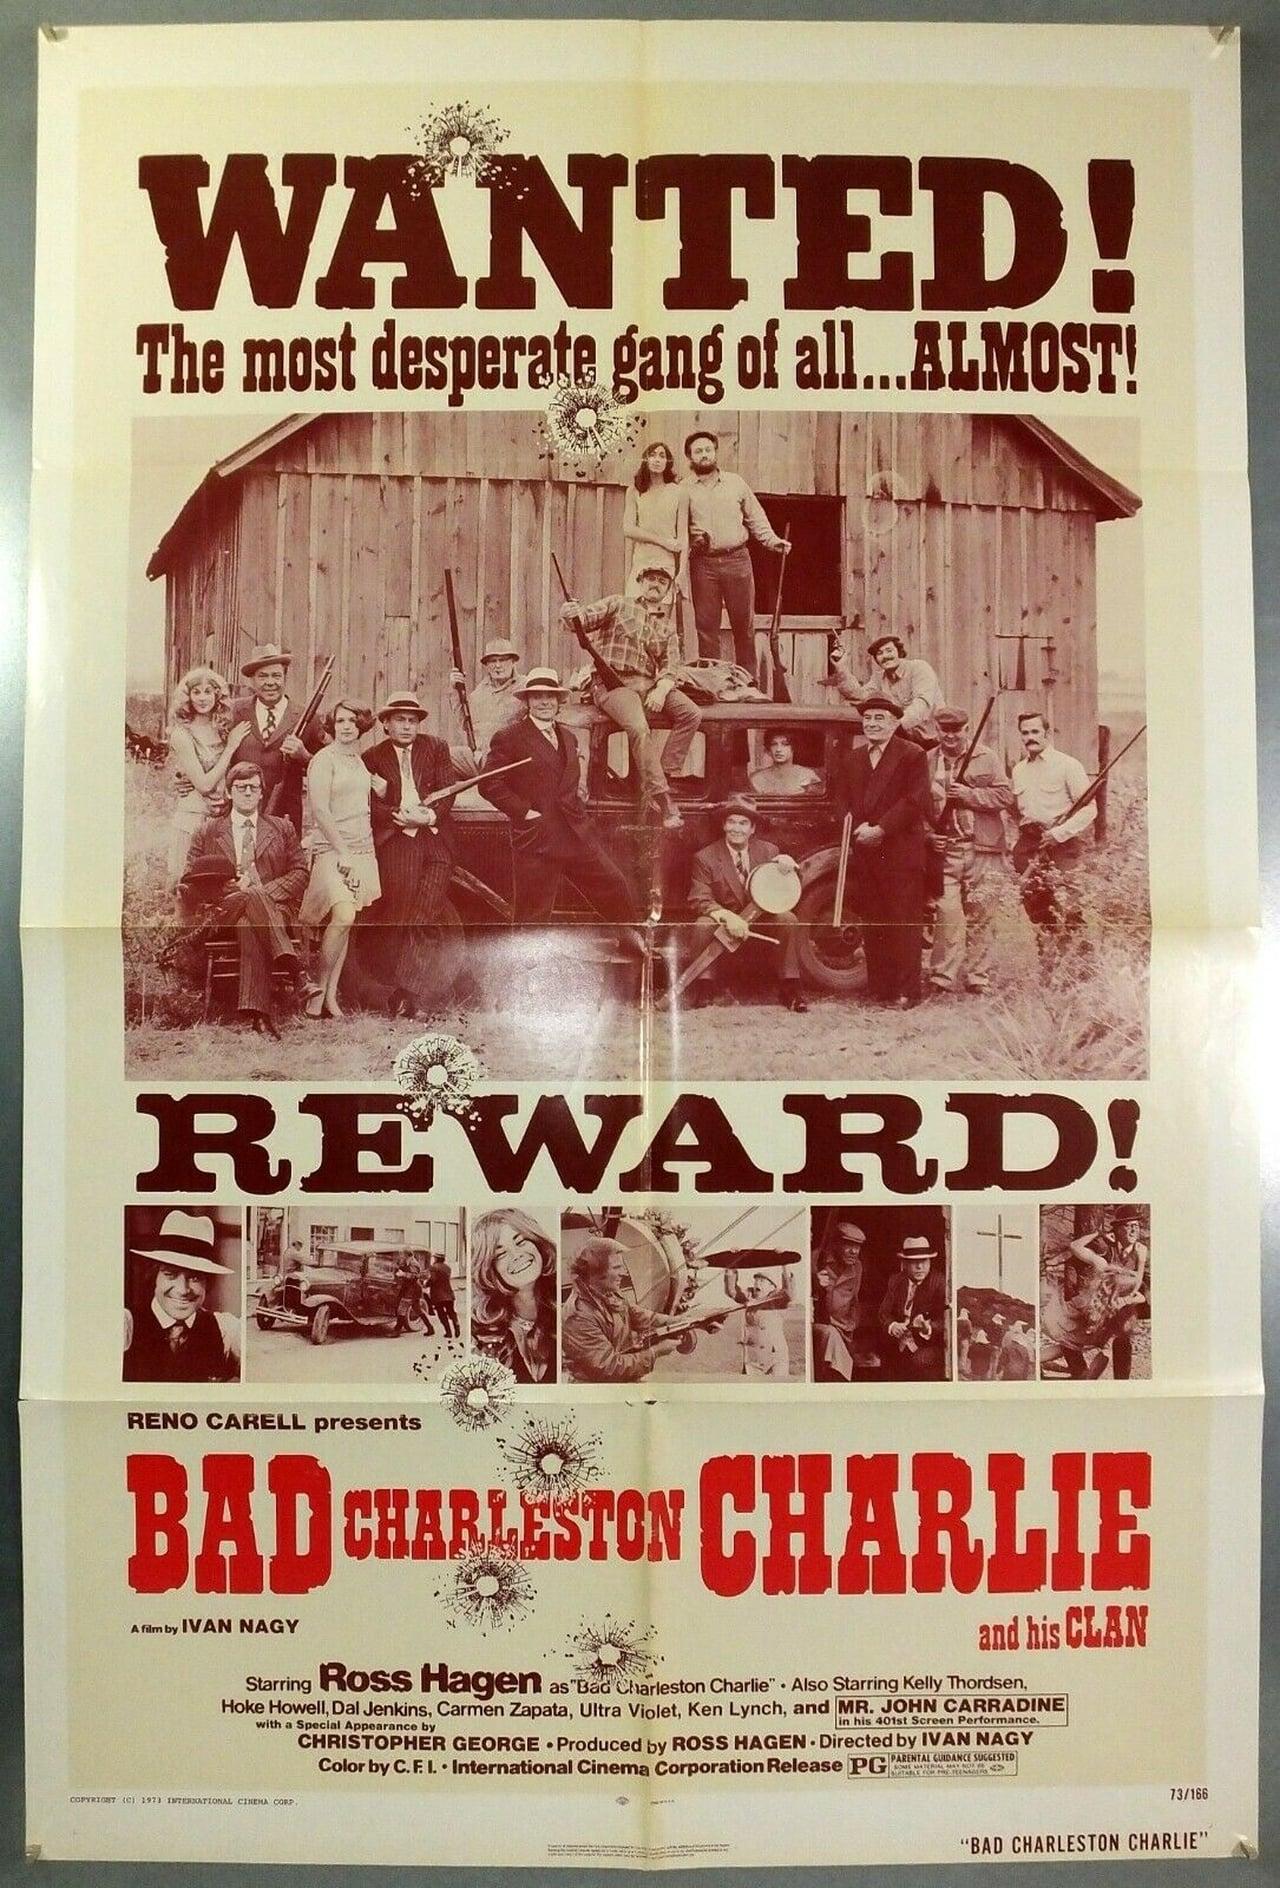 Bad Charleston Charlie